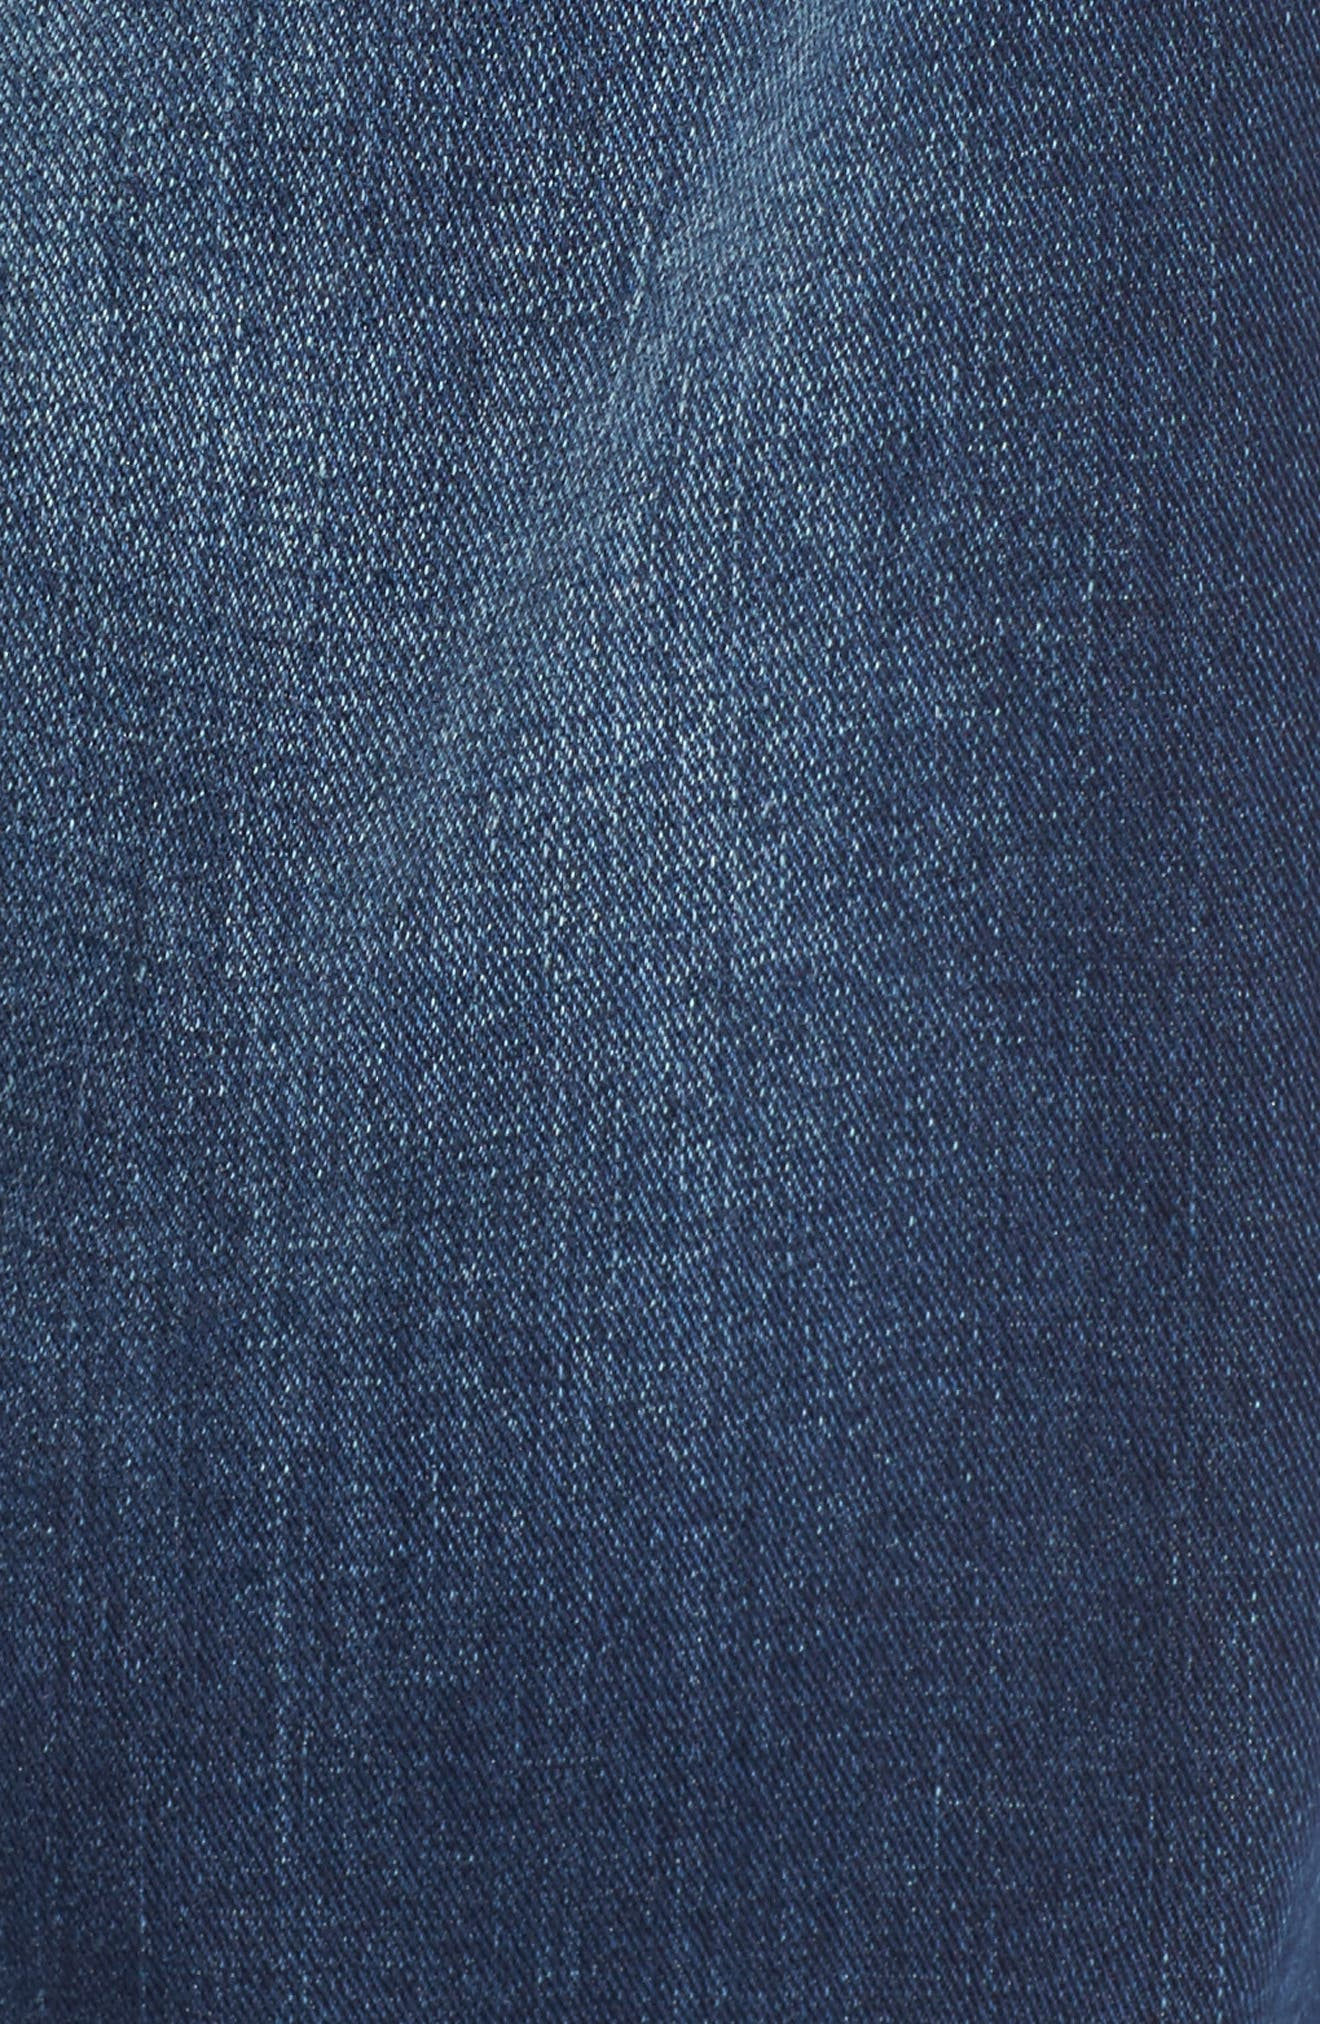 Maverick Stretch Slim Fit Jeans,                             Alternate thumbnail 5, color,                             400